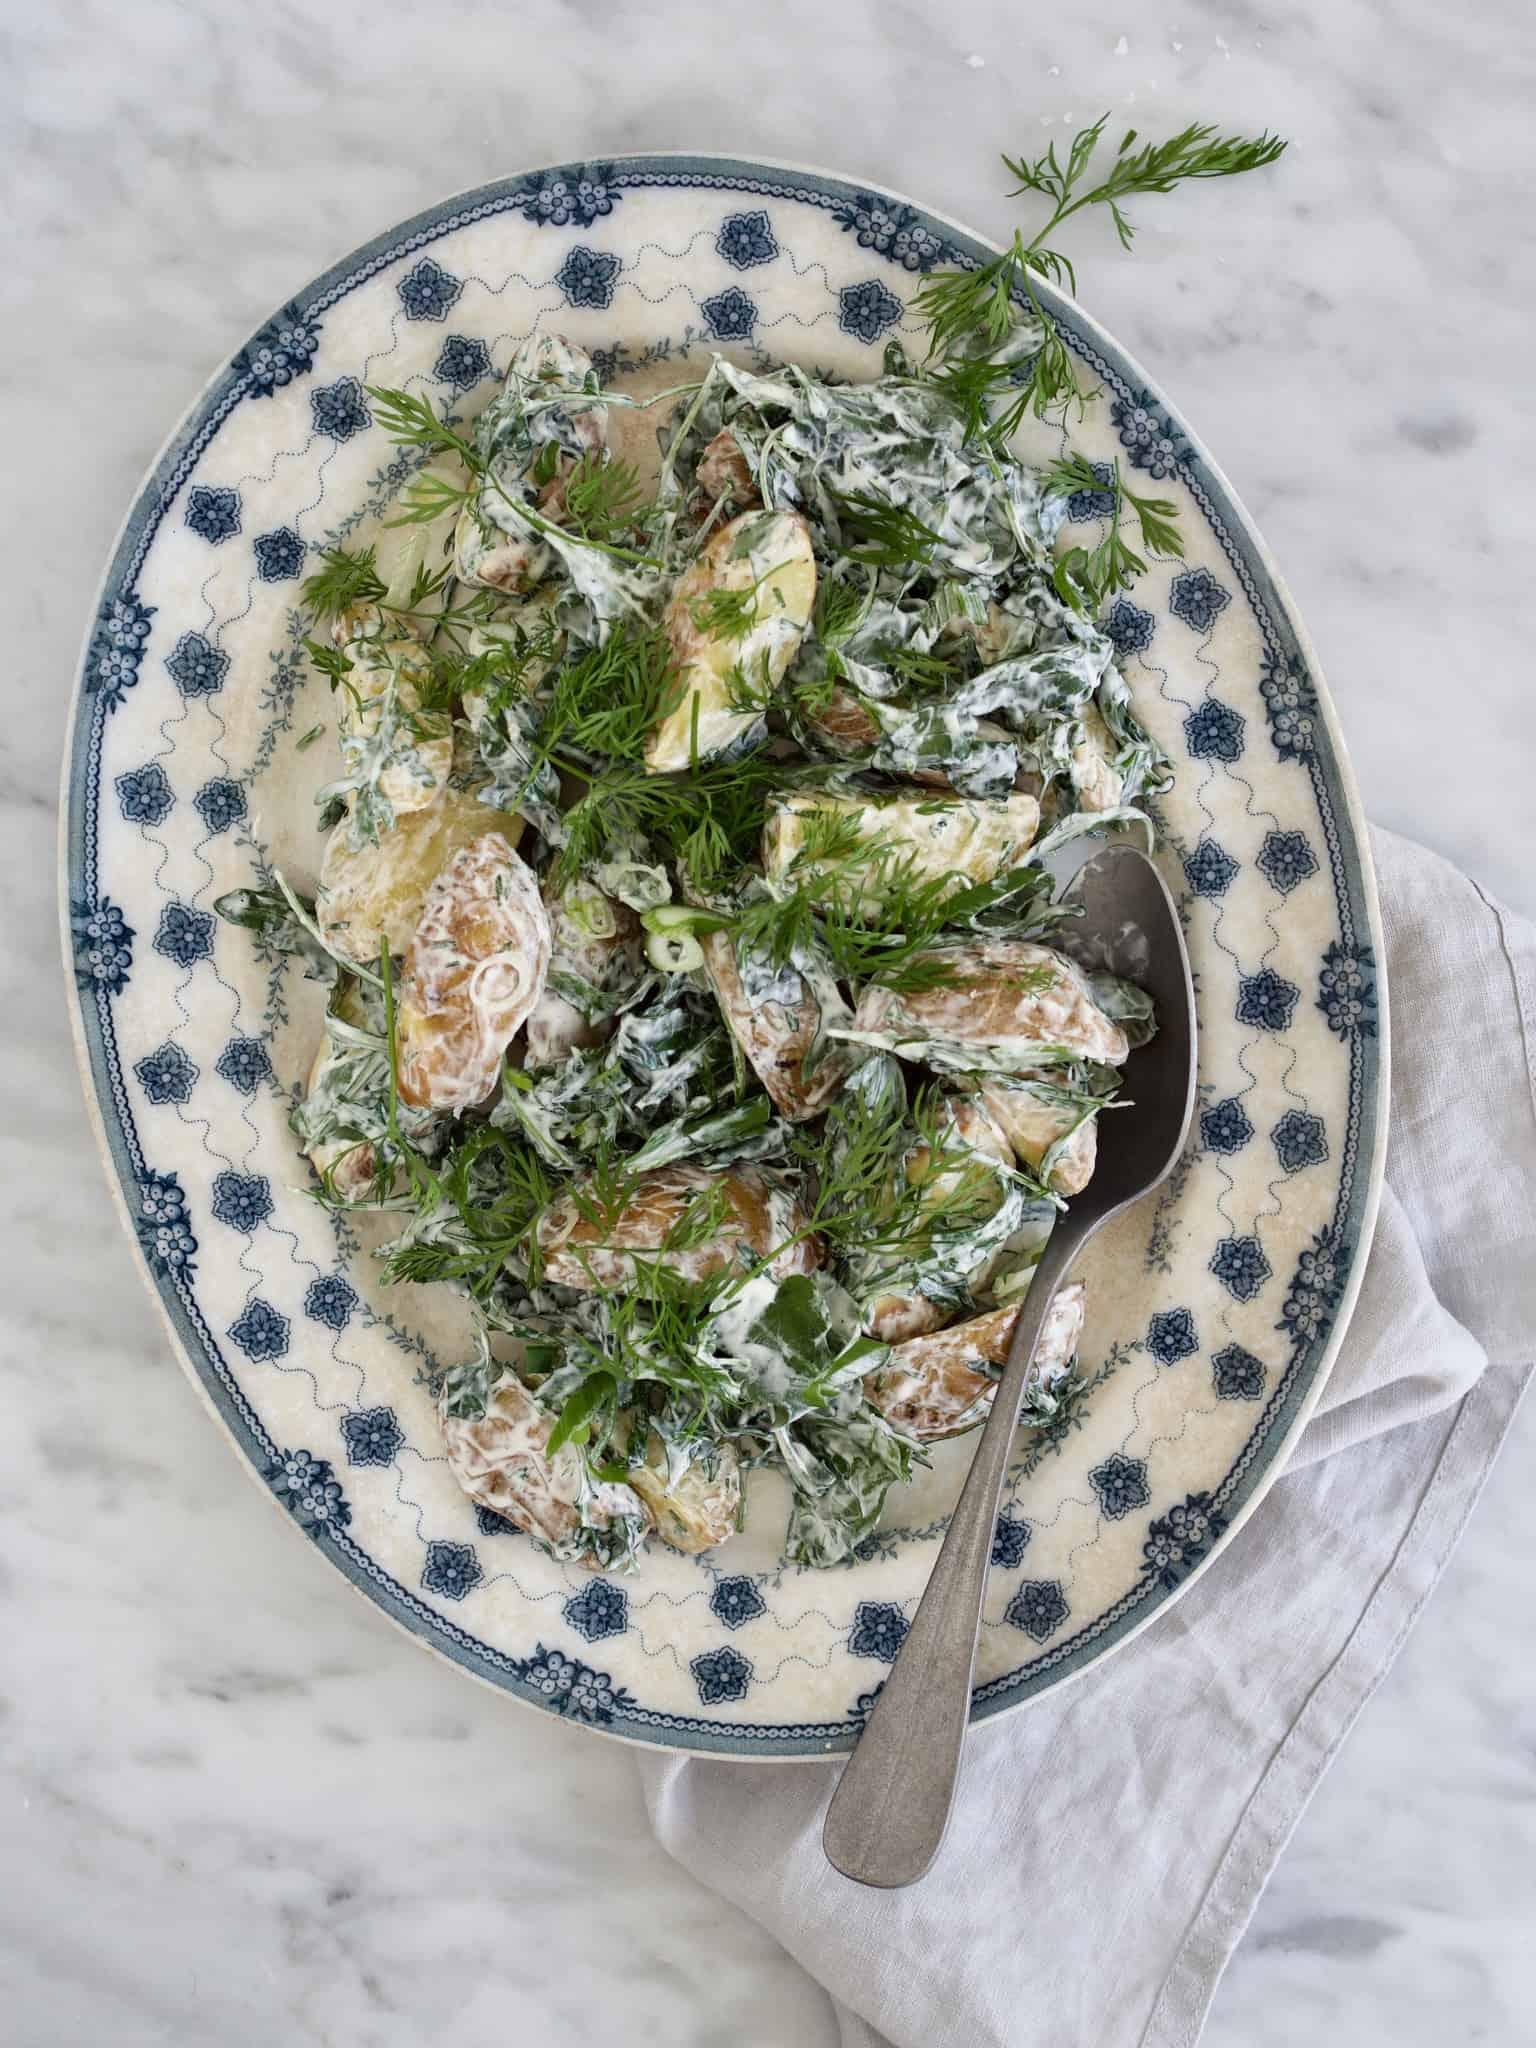 Hjemmelavet kold kartoffelsalat med dild og rucola